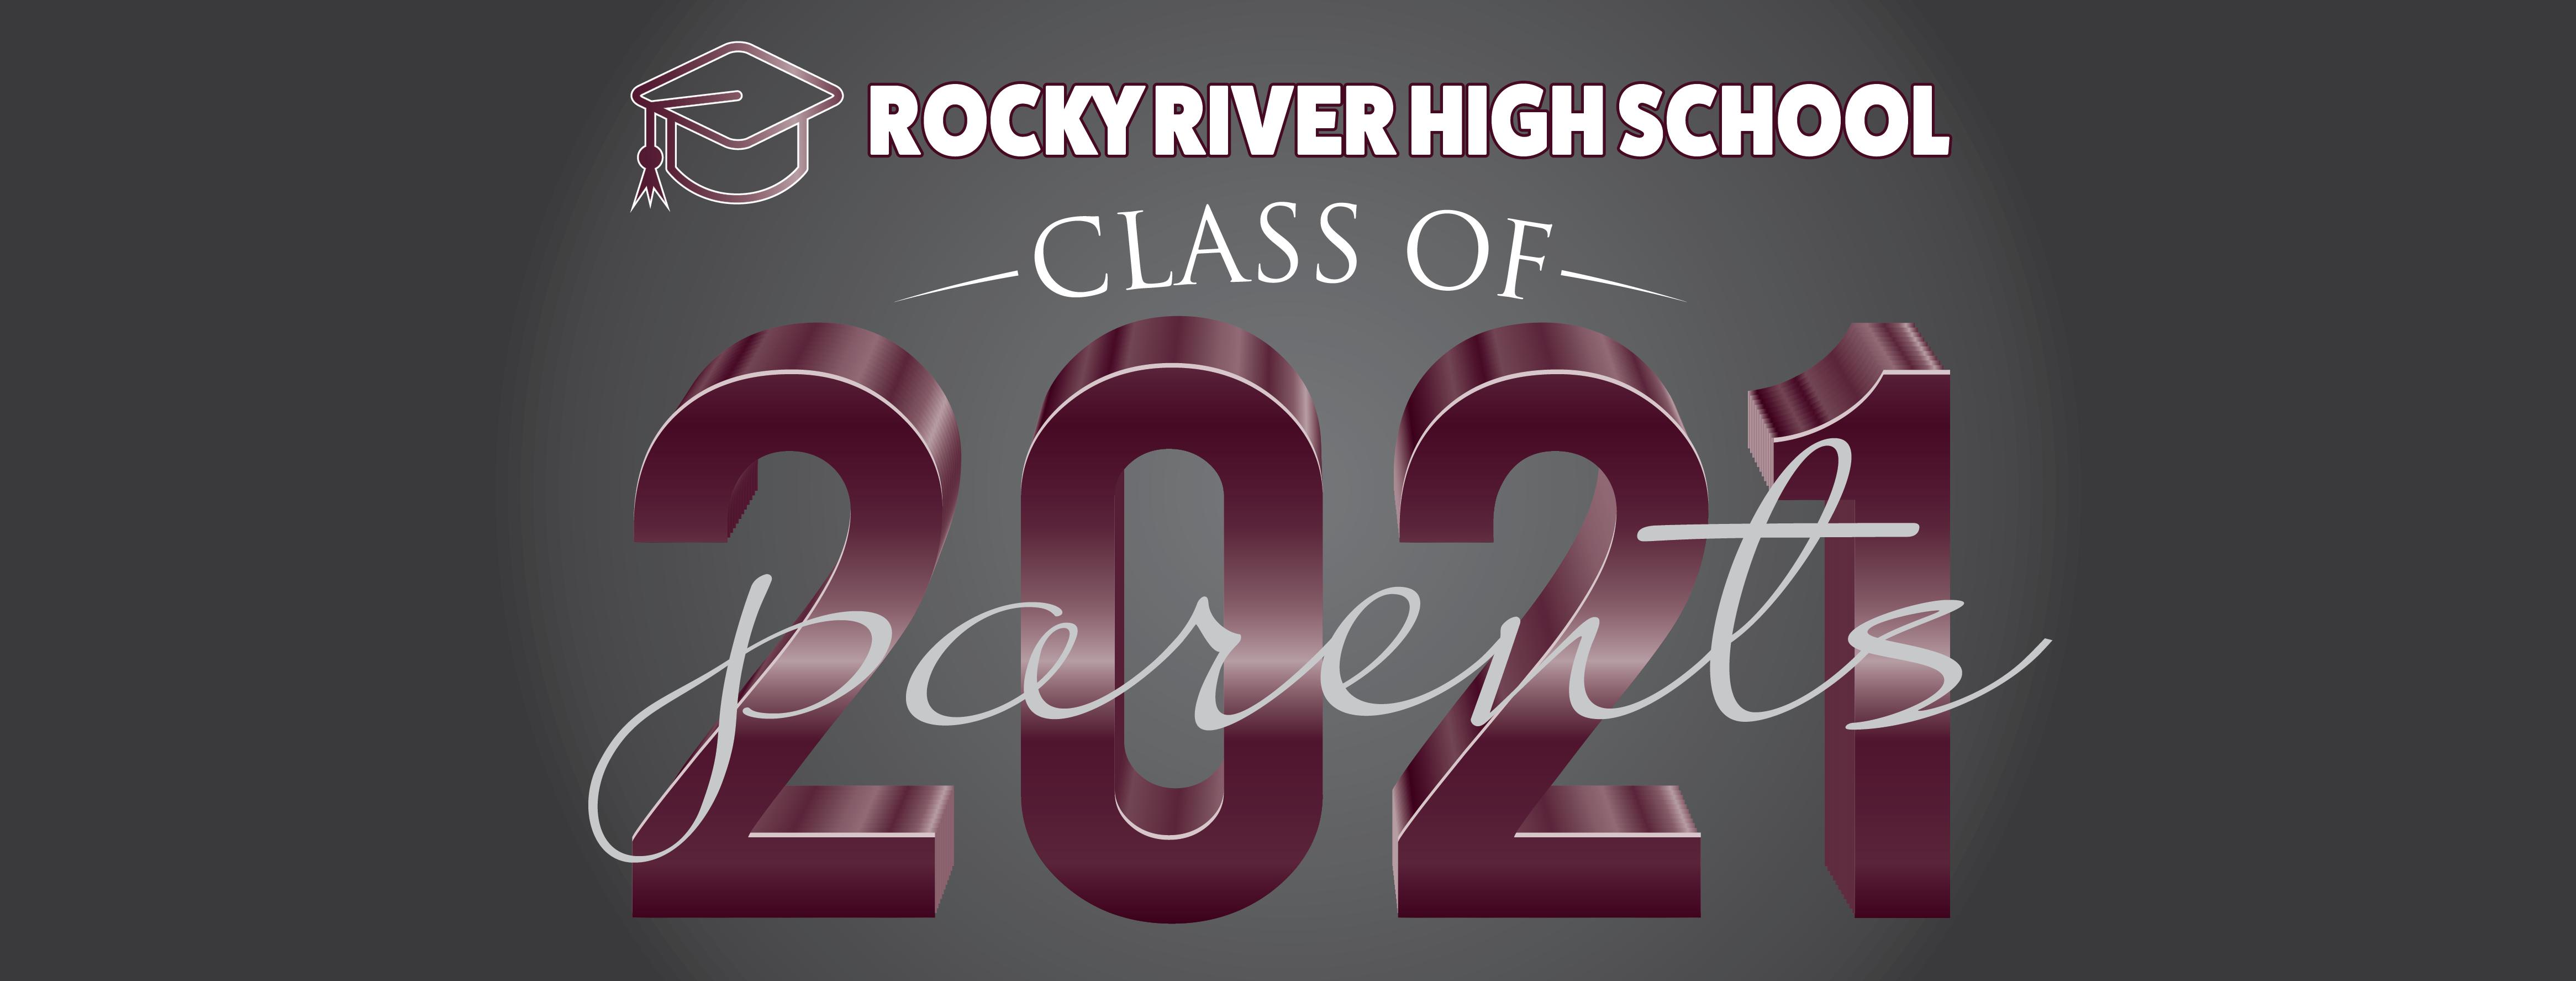 Class of 2021 senior parents logo